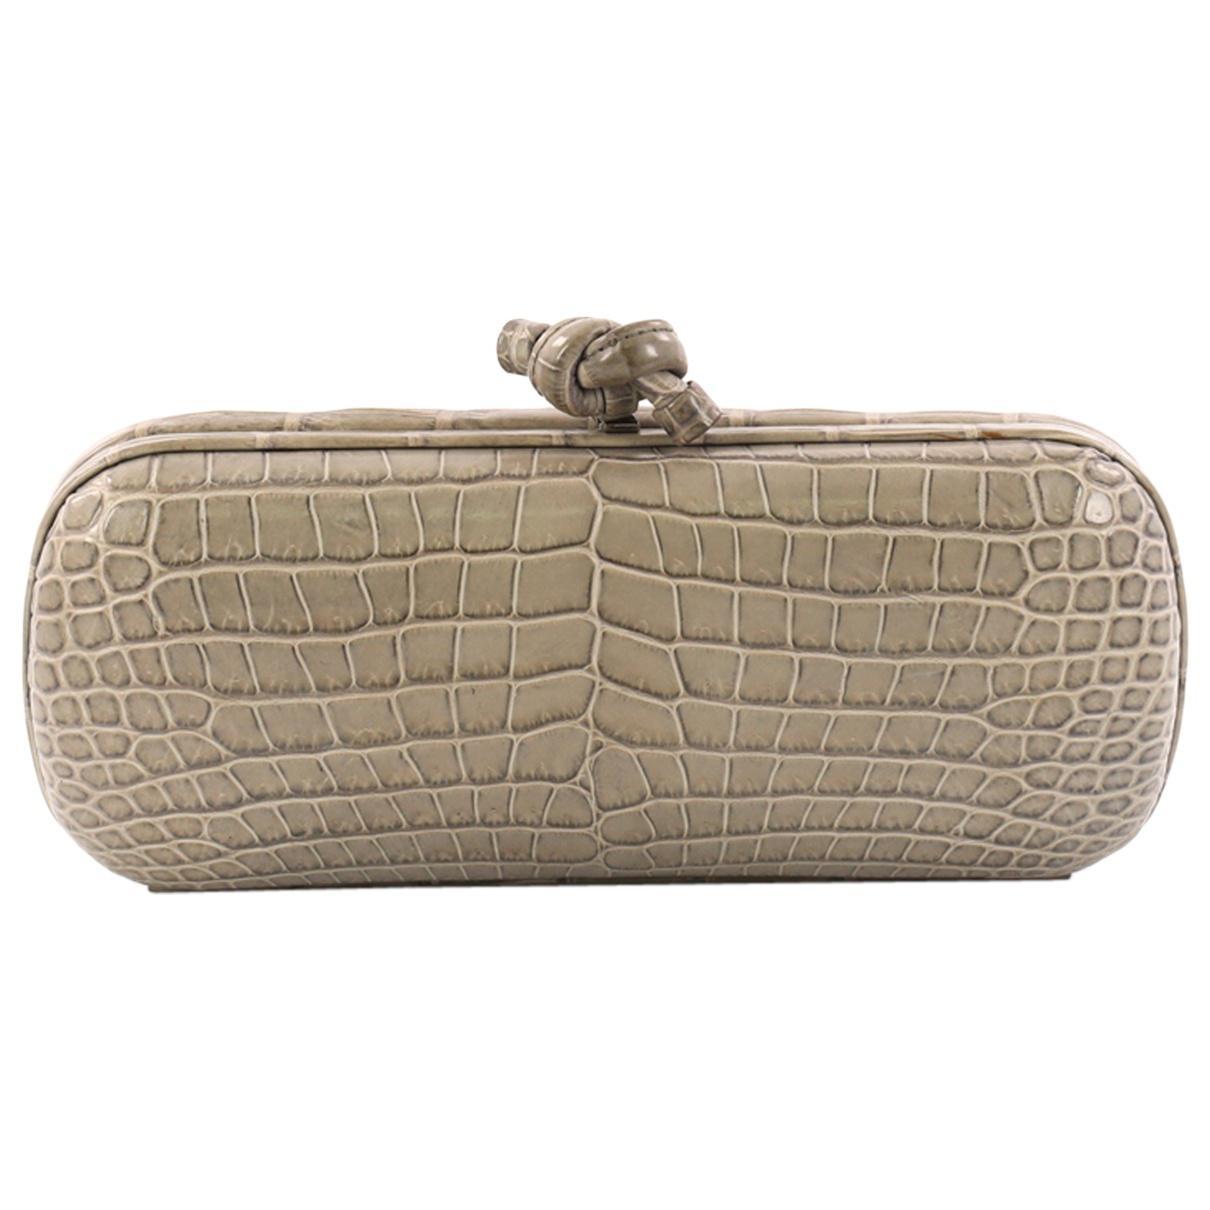 Lyst - Bottega Veneta Pre-owned Pochette Knot Crocodile Clutch Bag ... d75007264b9af